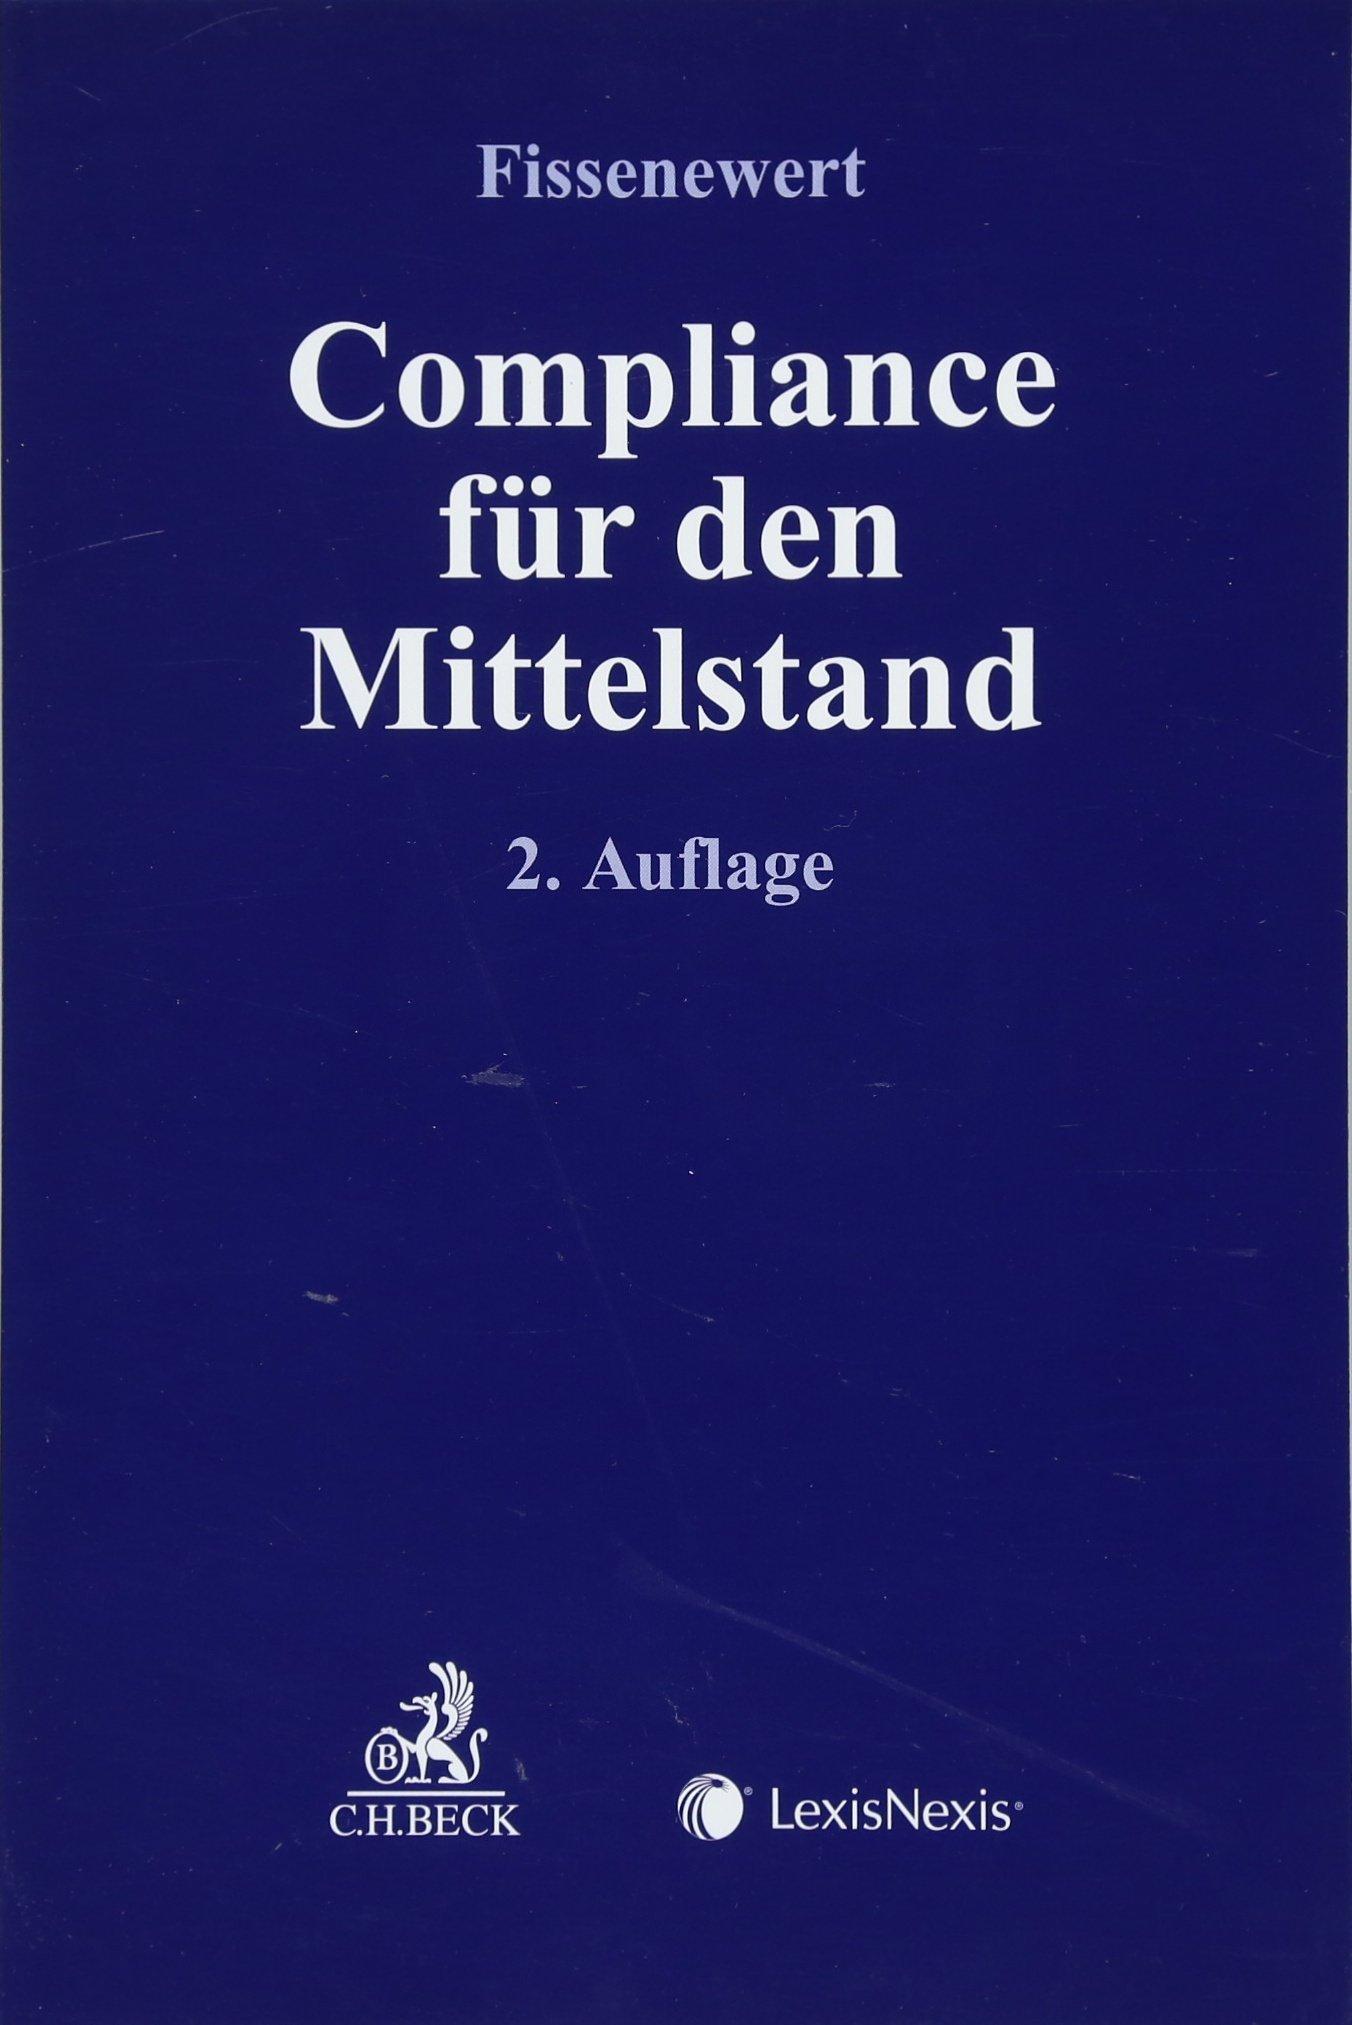 Compliance für den Mittelstand Taschenbuch – 5. April 2018 Peter Fissenewert Jens Bäumer Stefan Behringer Carsten Brachmann